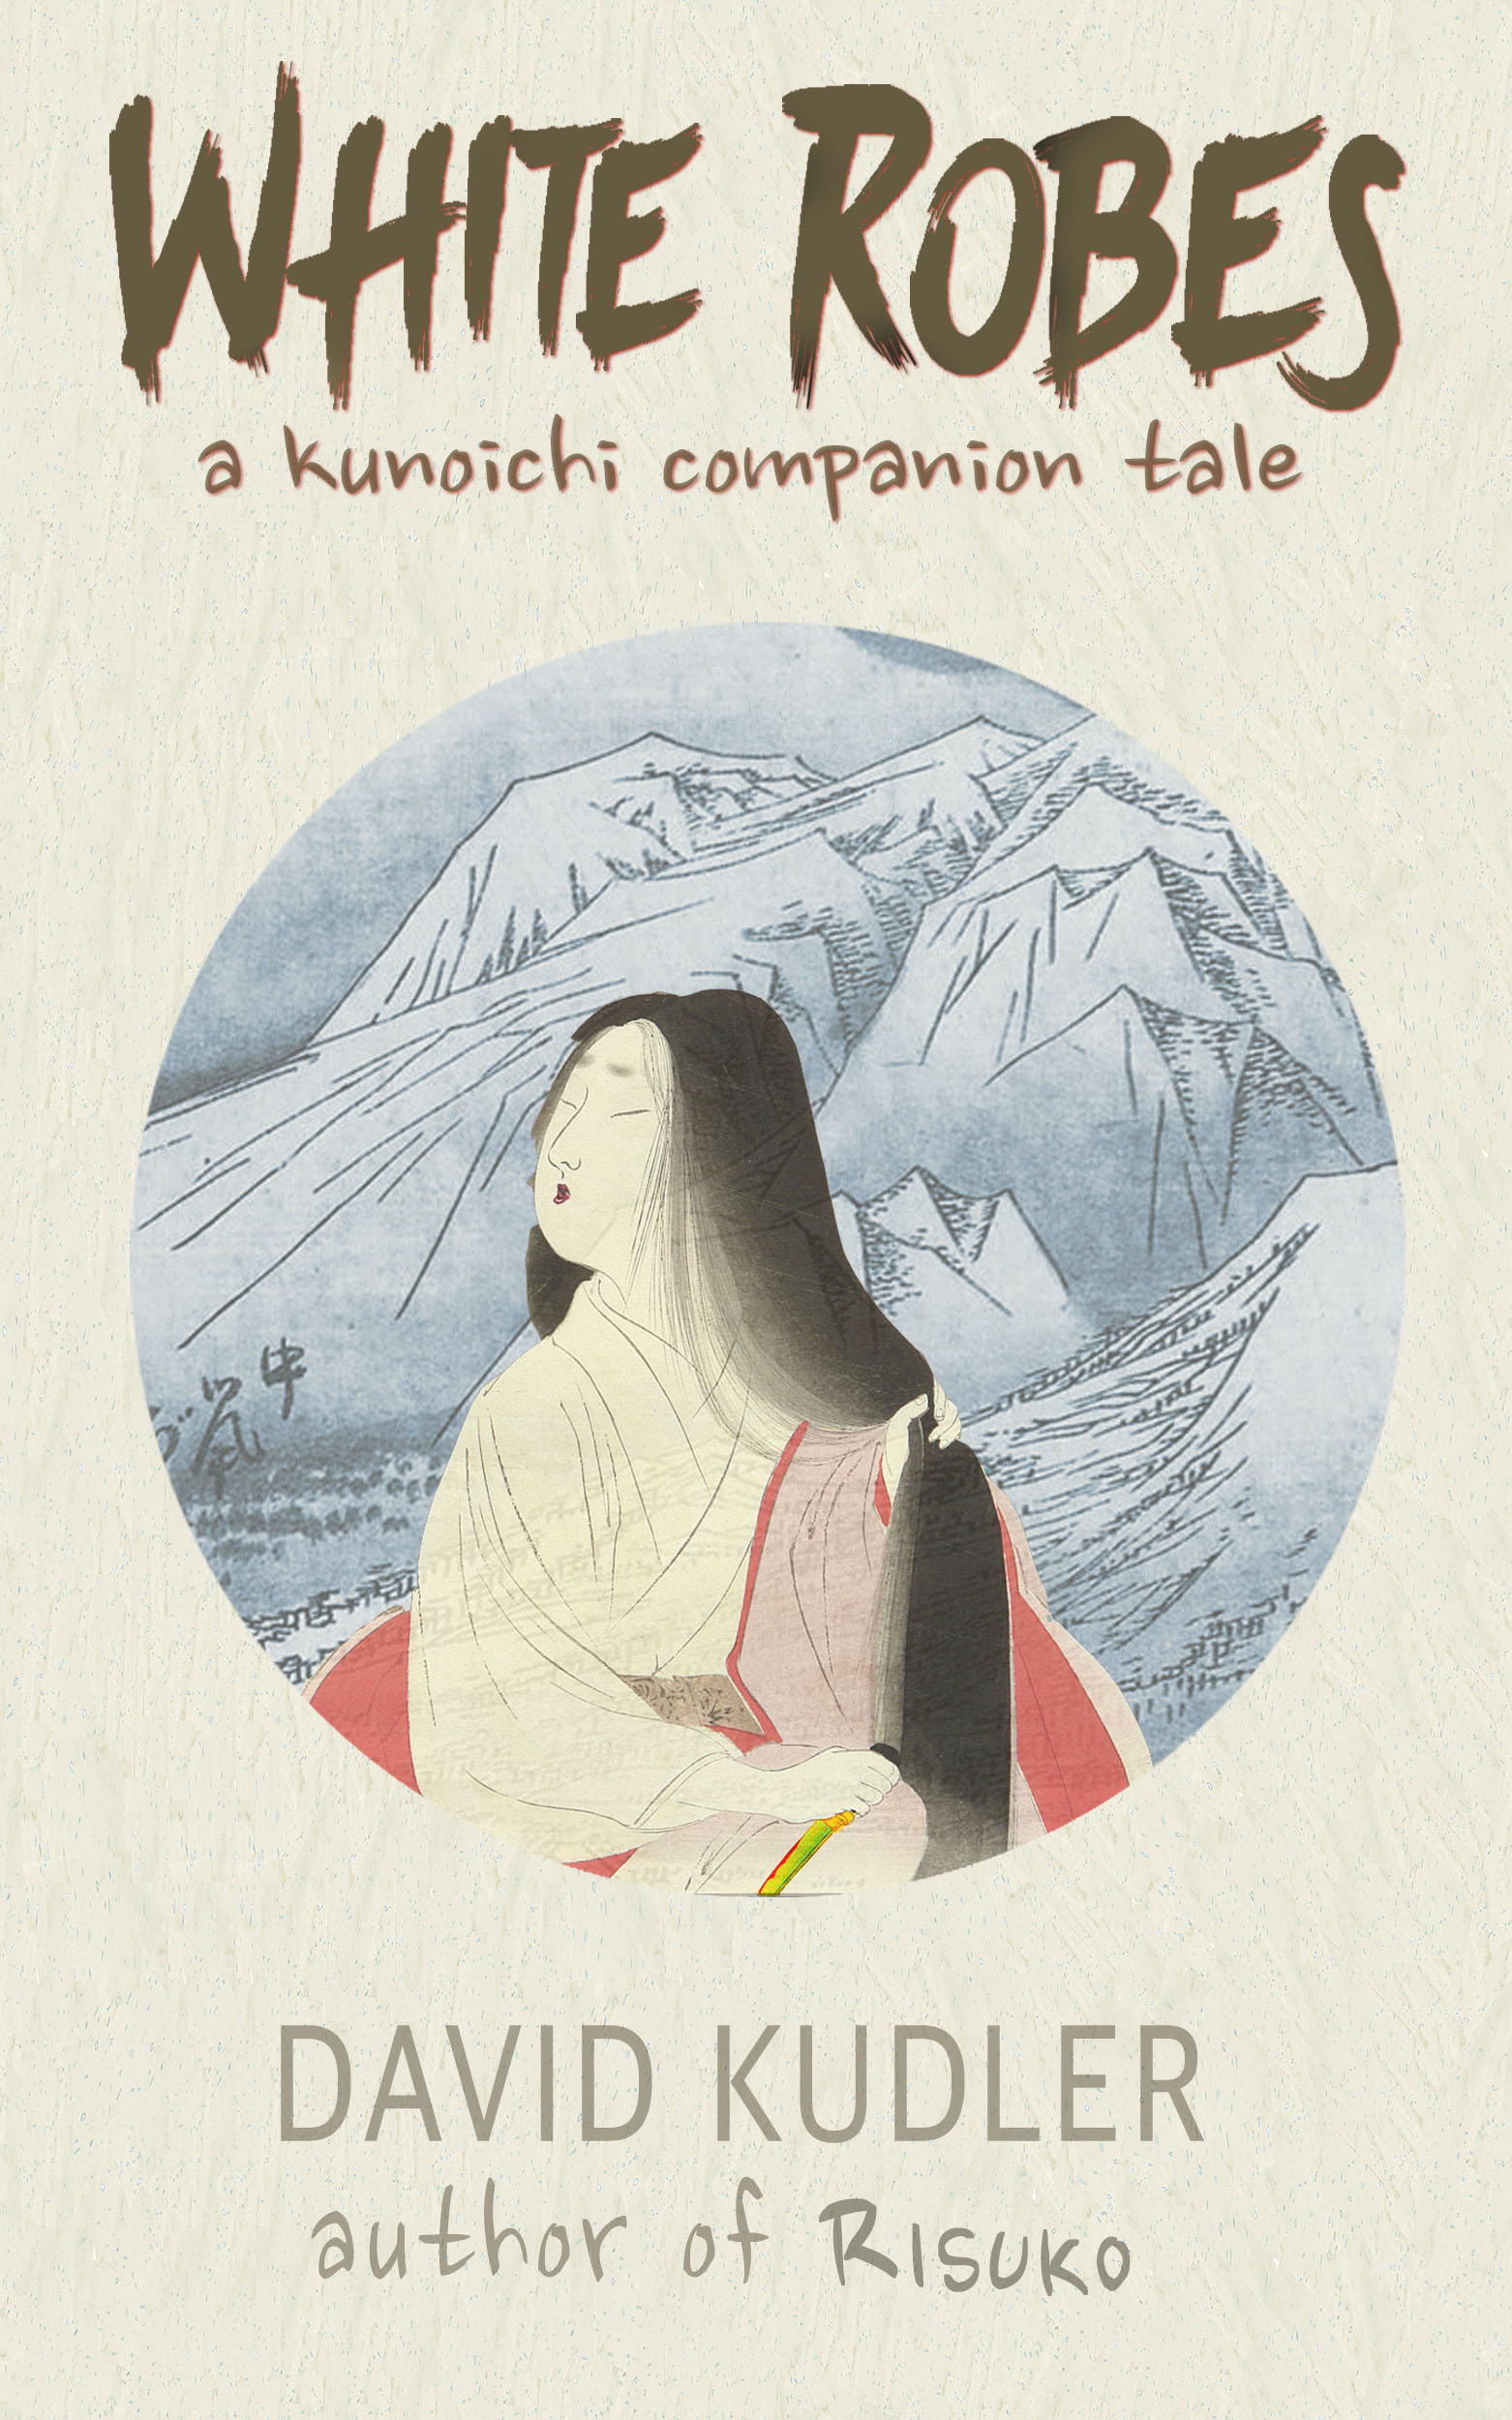 White Robes - A Kunoichi Companion Tale